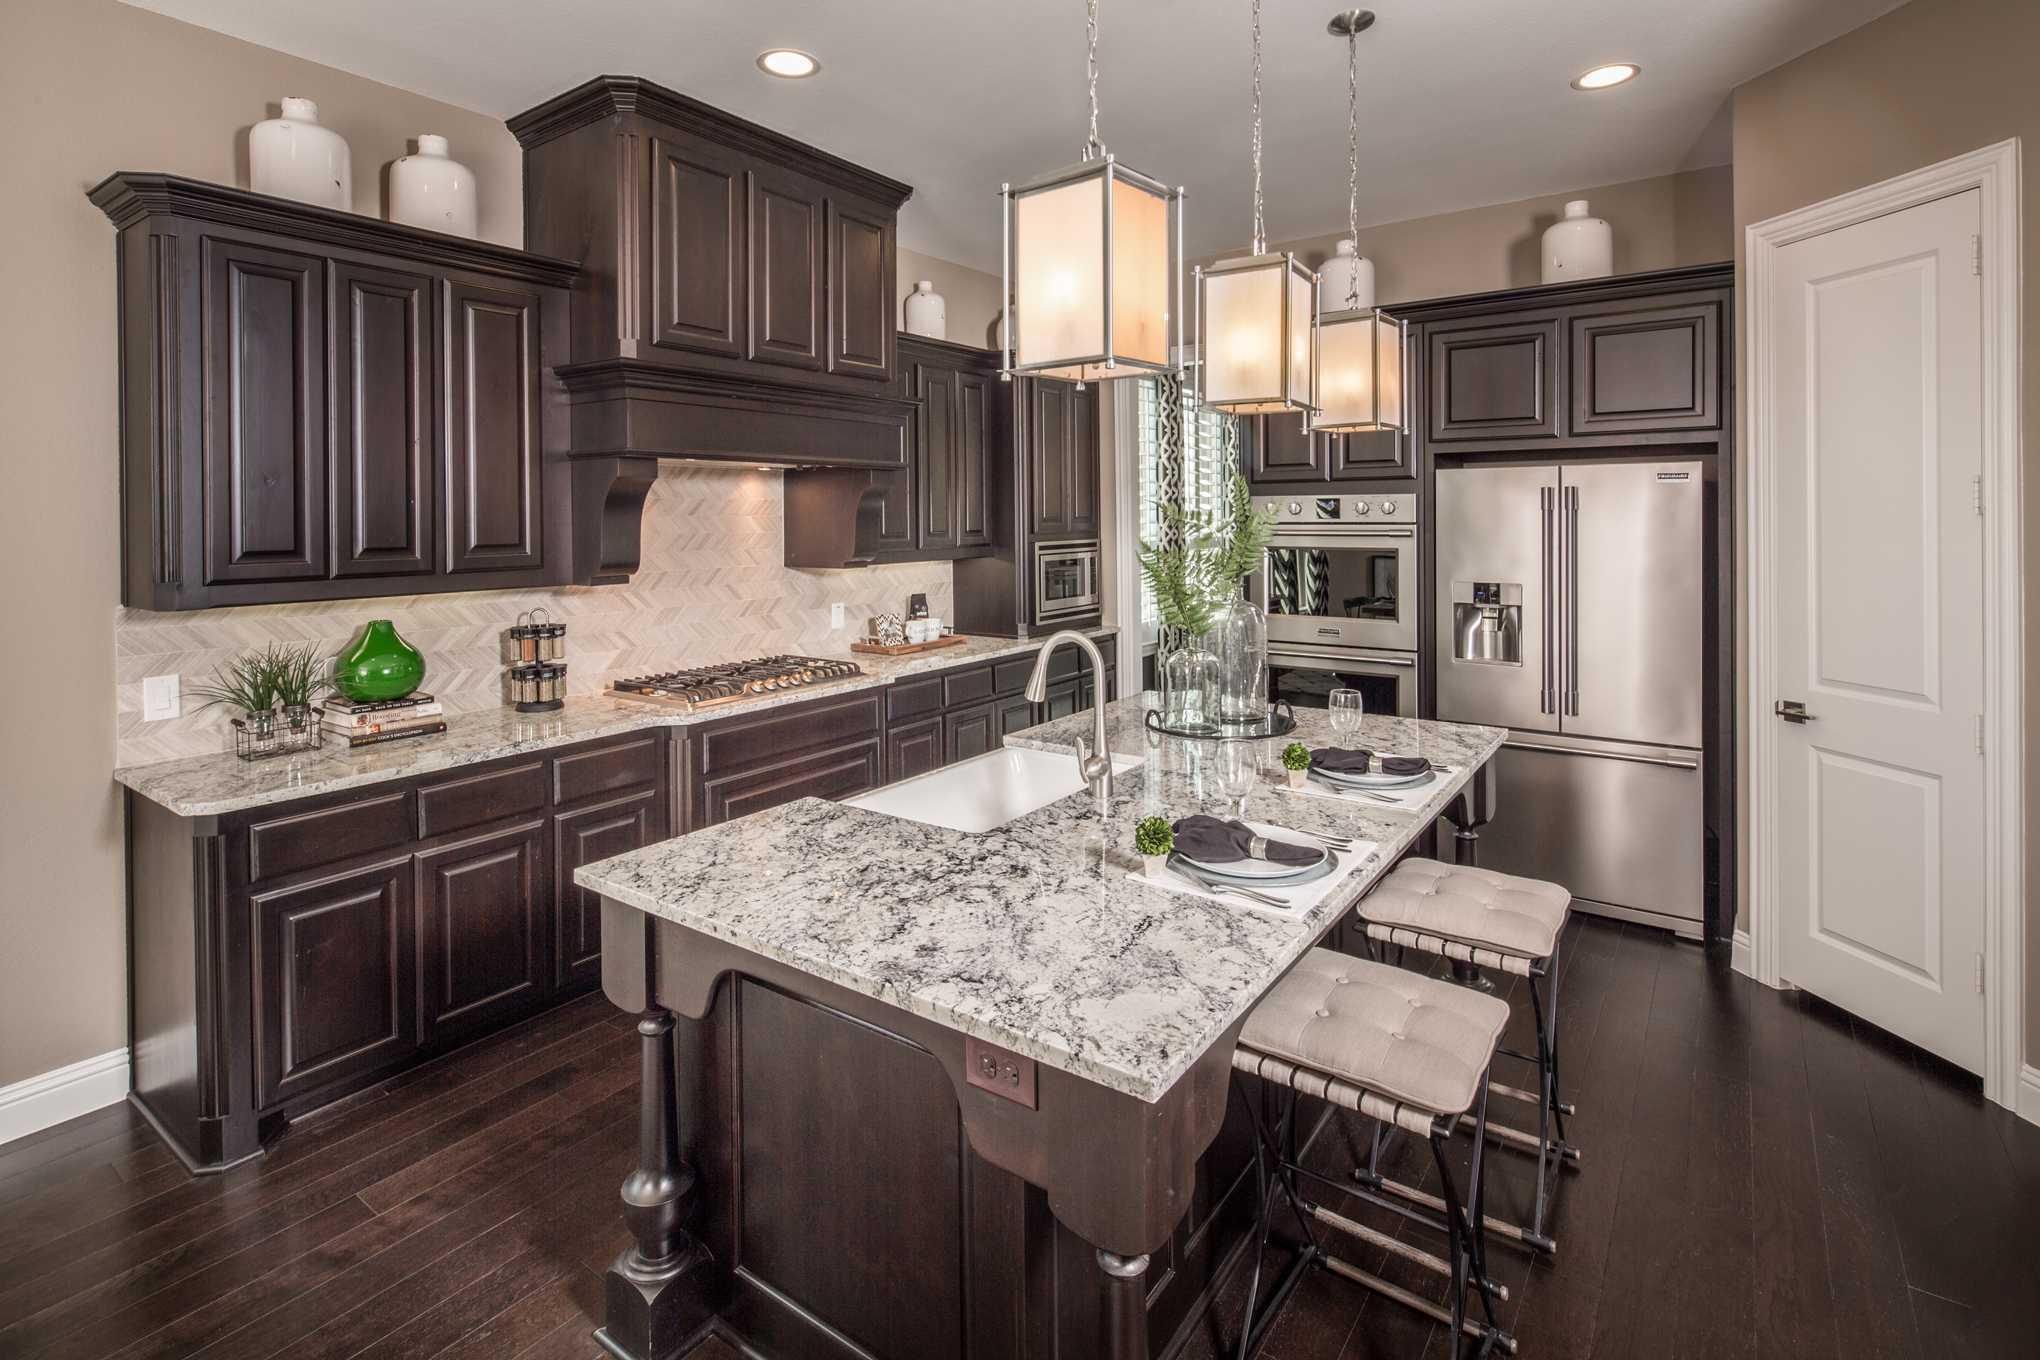 Kitchen-in-Plan 267-at-Star Trail: 86ft. lots-in-Prosper